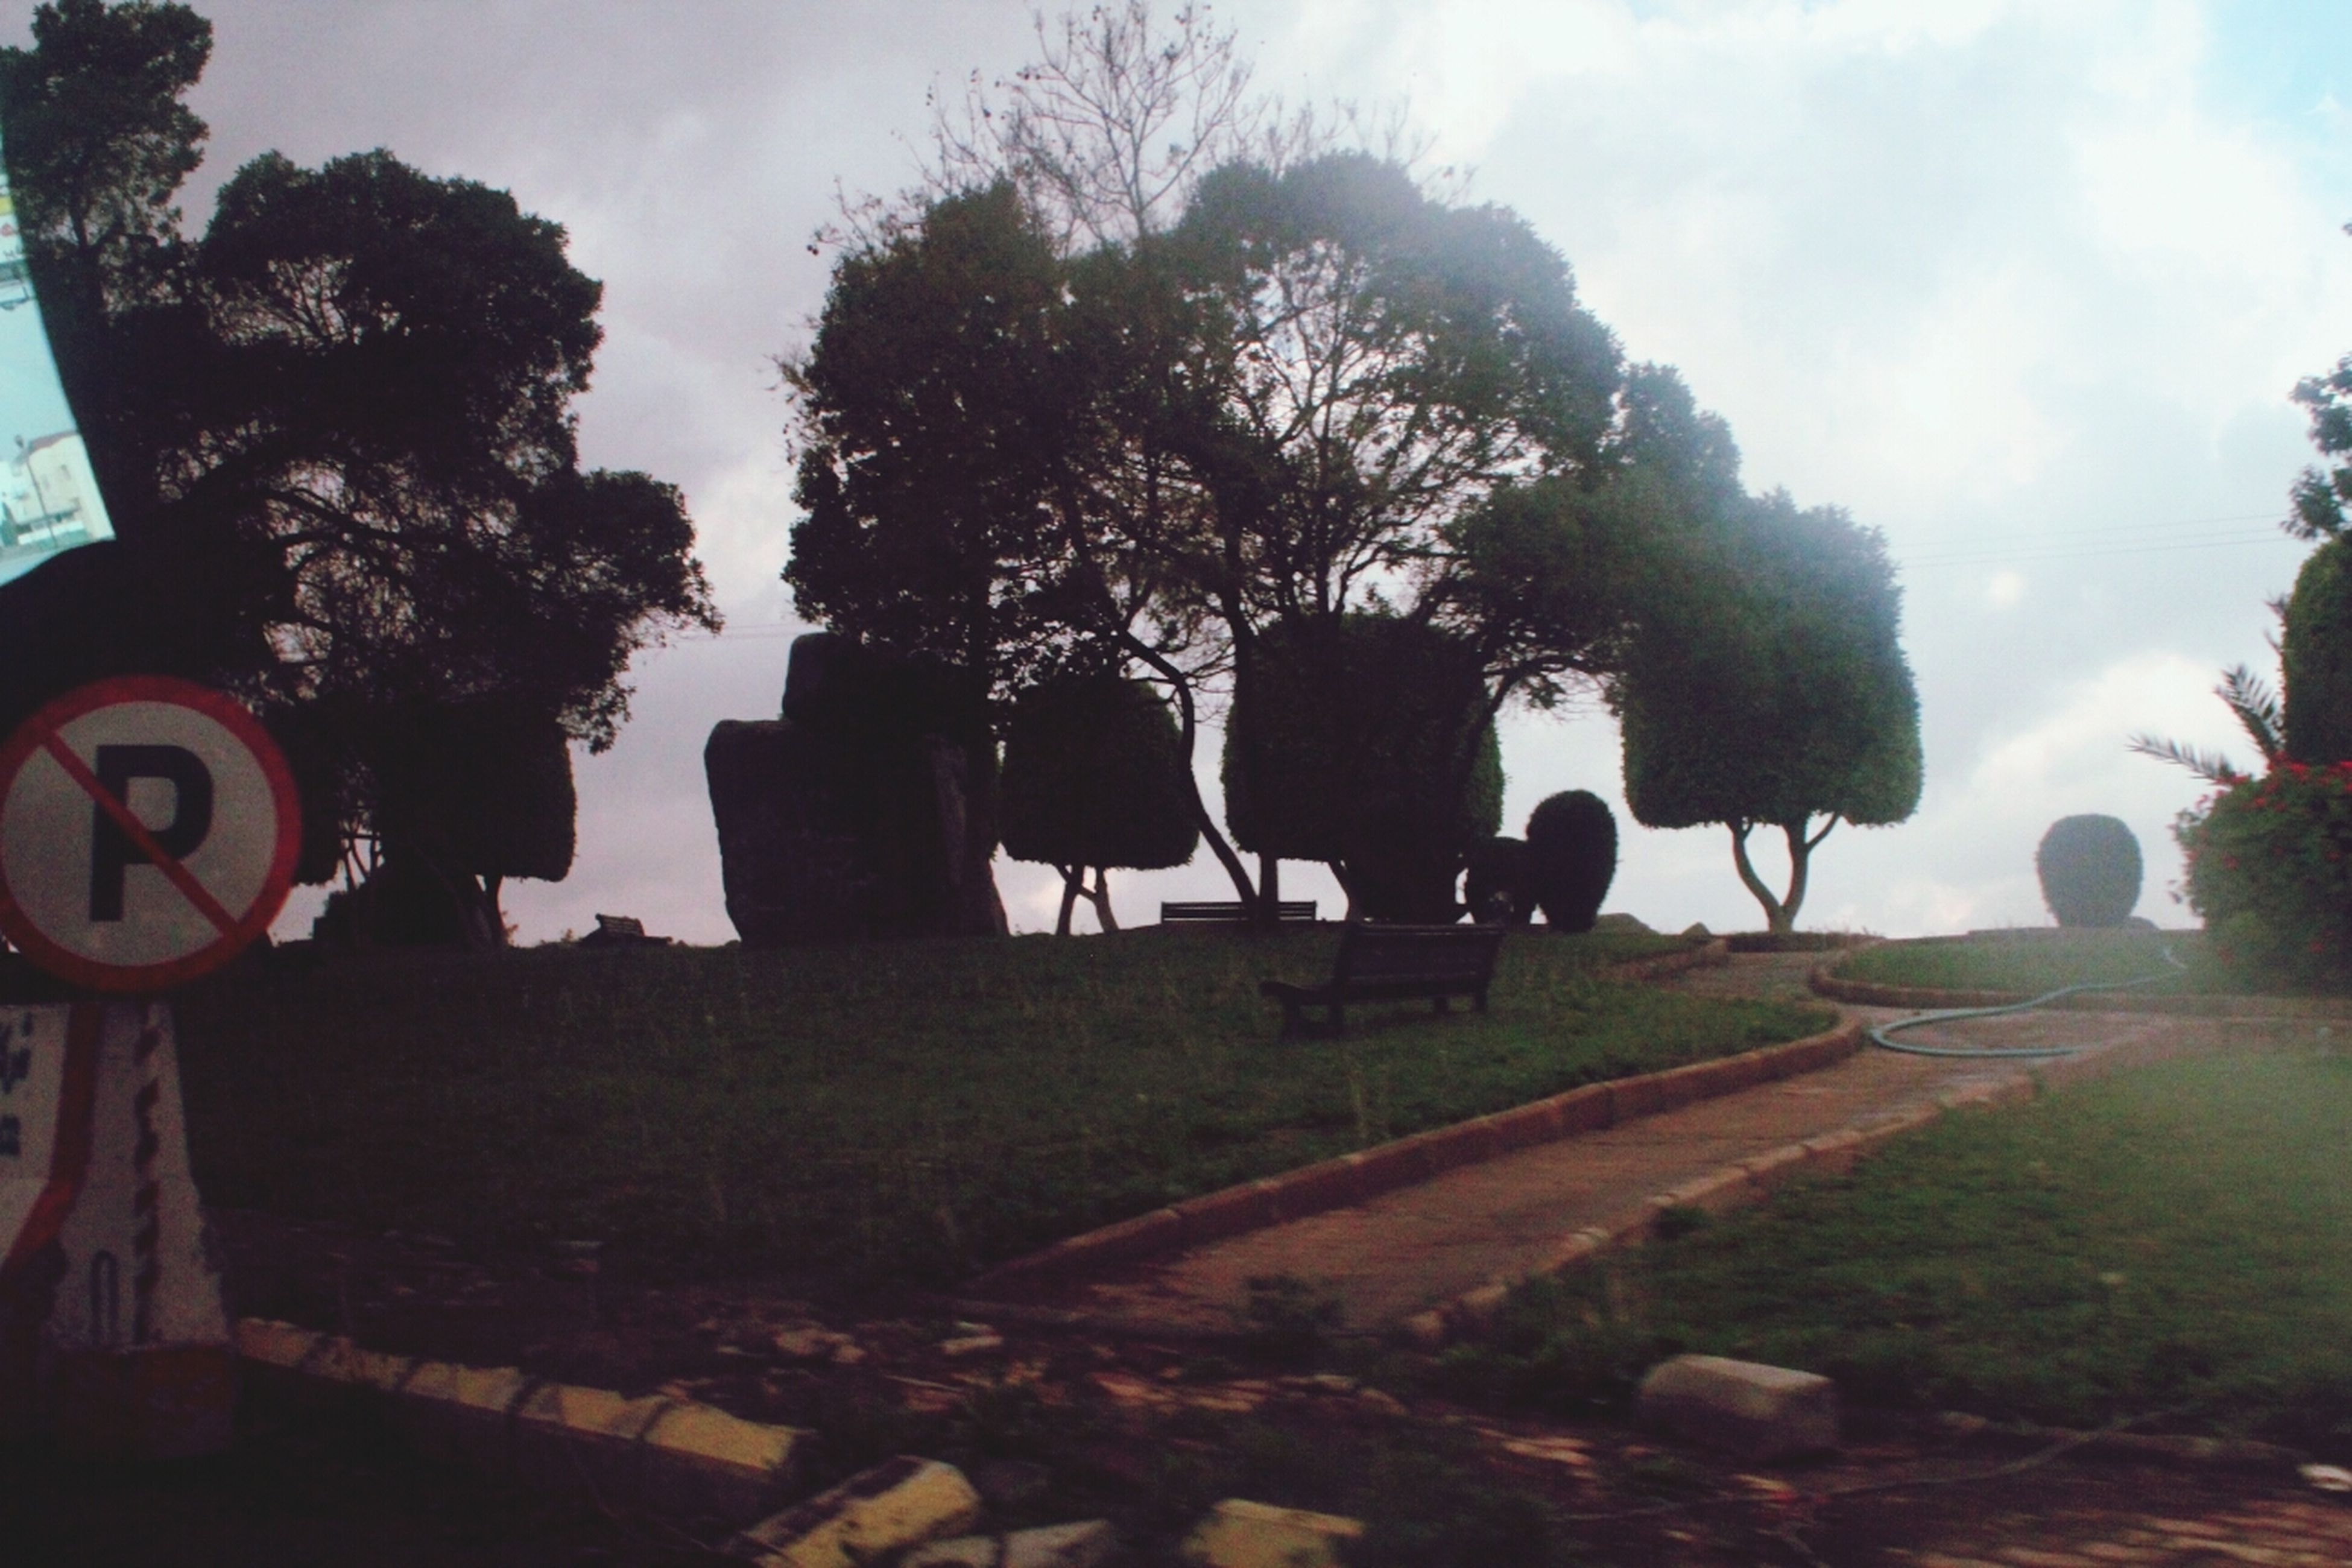 tree, sky, animal themes, art and craft, sculpture, art, animal representation, cloud - sky, creativity, statue, mammal, built structure, cloud, human representation, cemetery, no people, nature, outdoors, sunlight